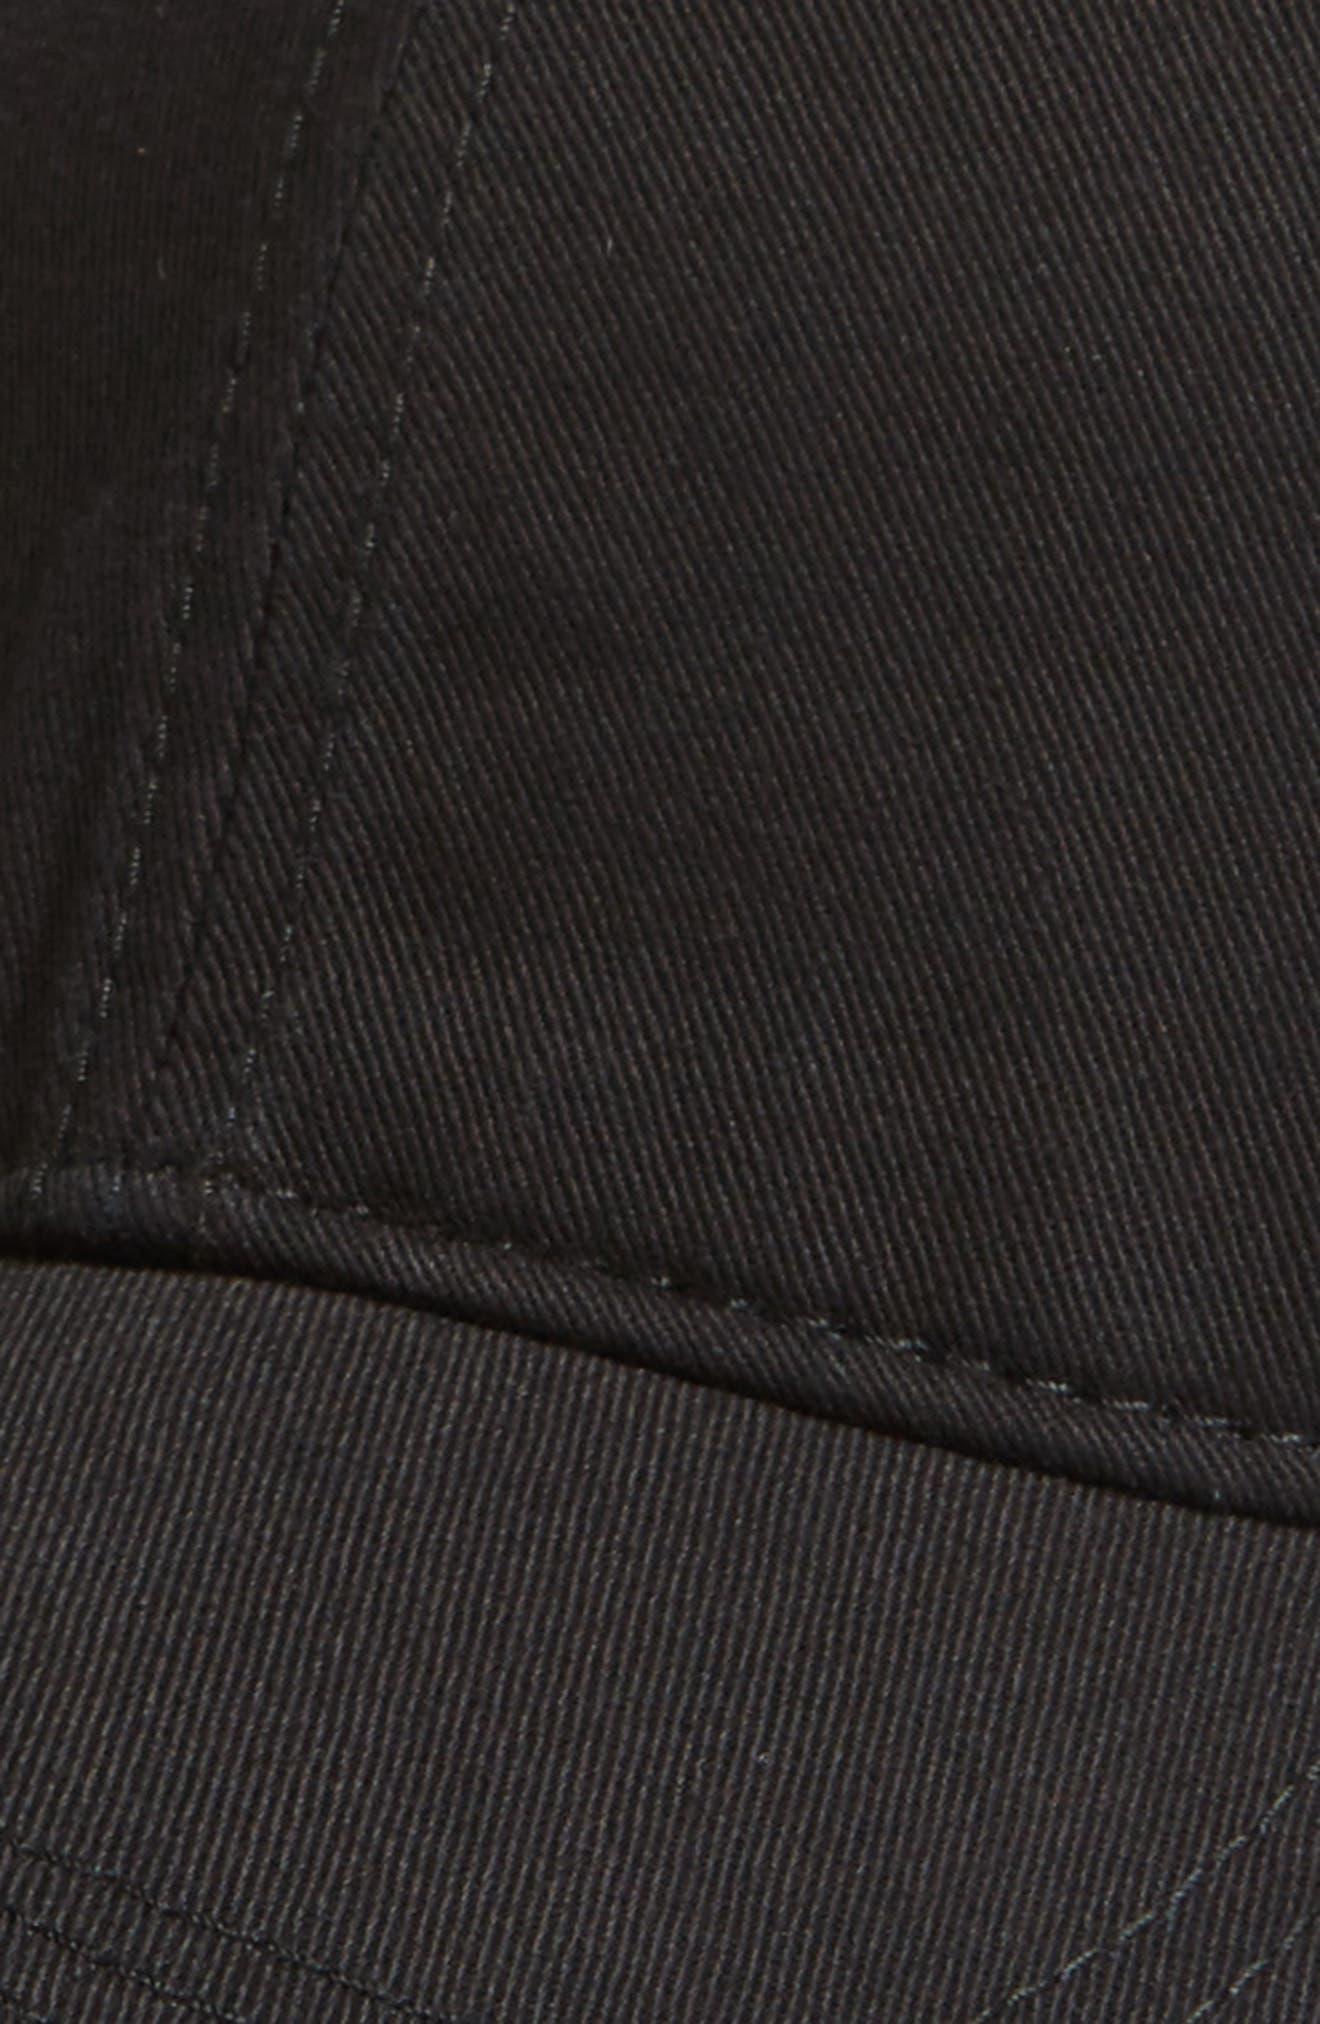 'Classic' Cap,                             Alternate thumbnail 3, color,                             Black